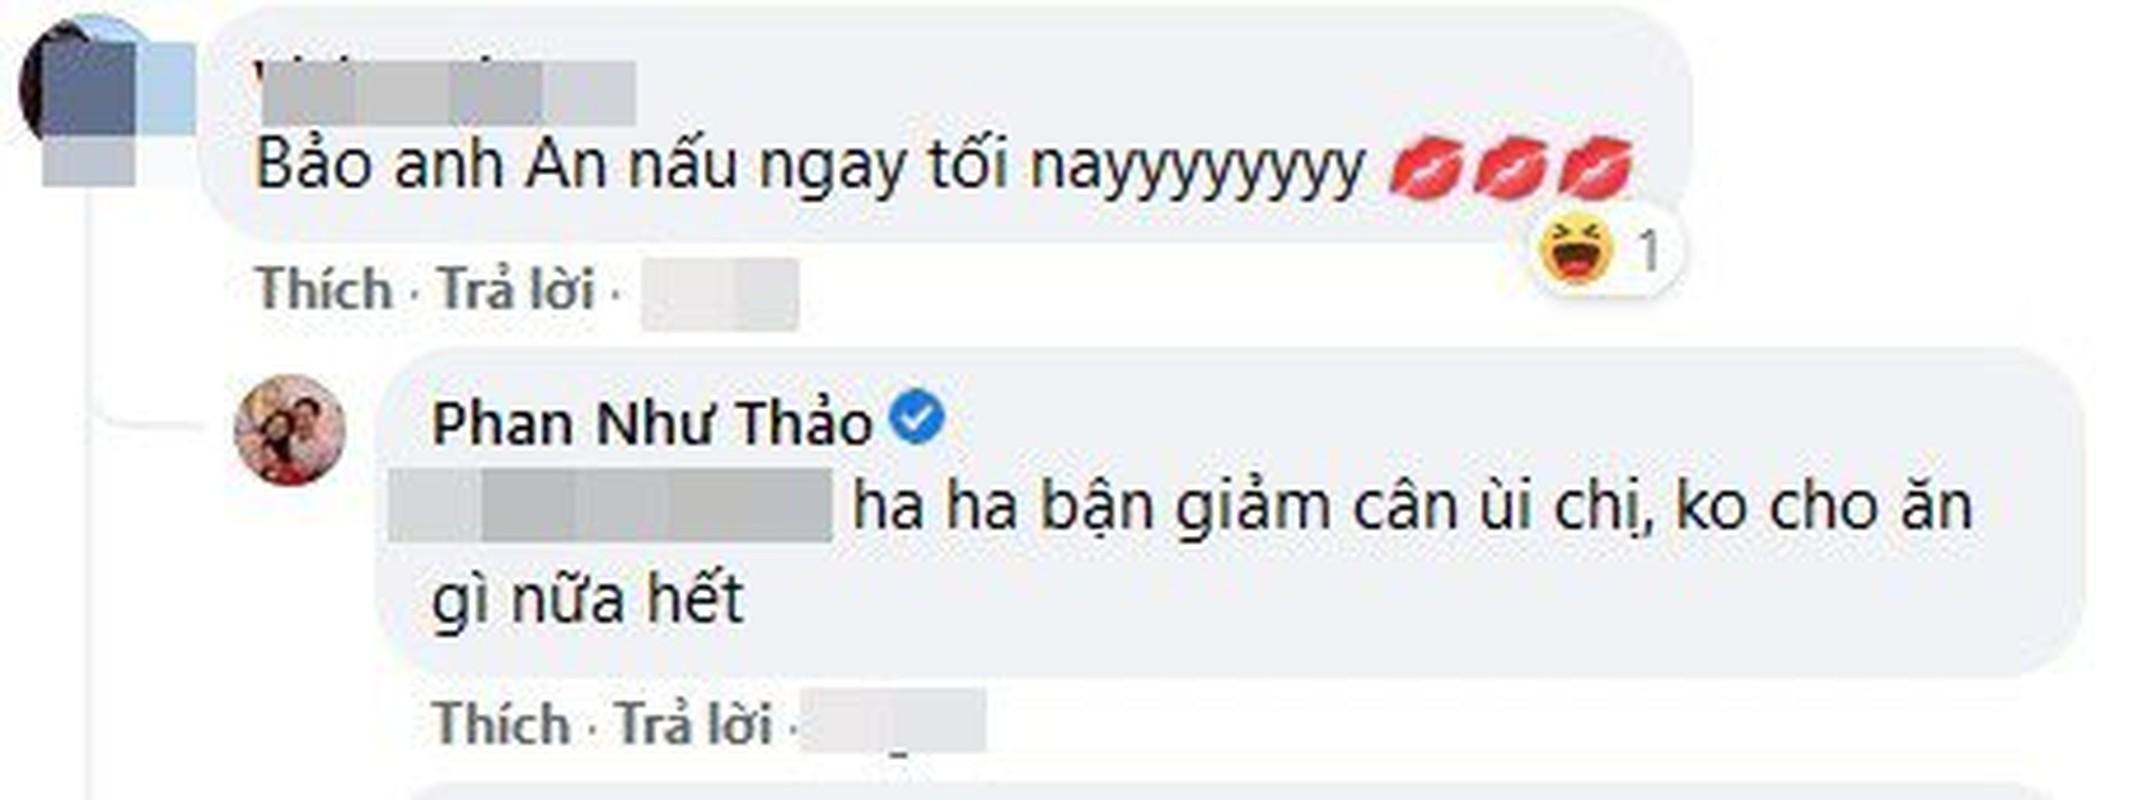 Miet mai giam can nhung Phan Nhu Thao van